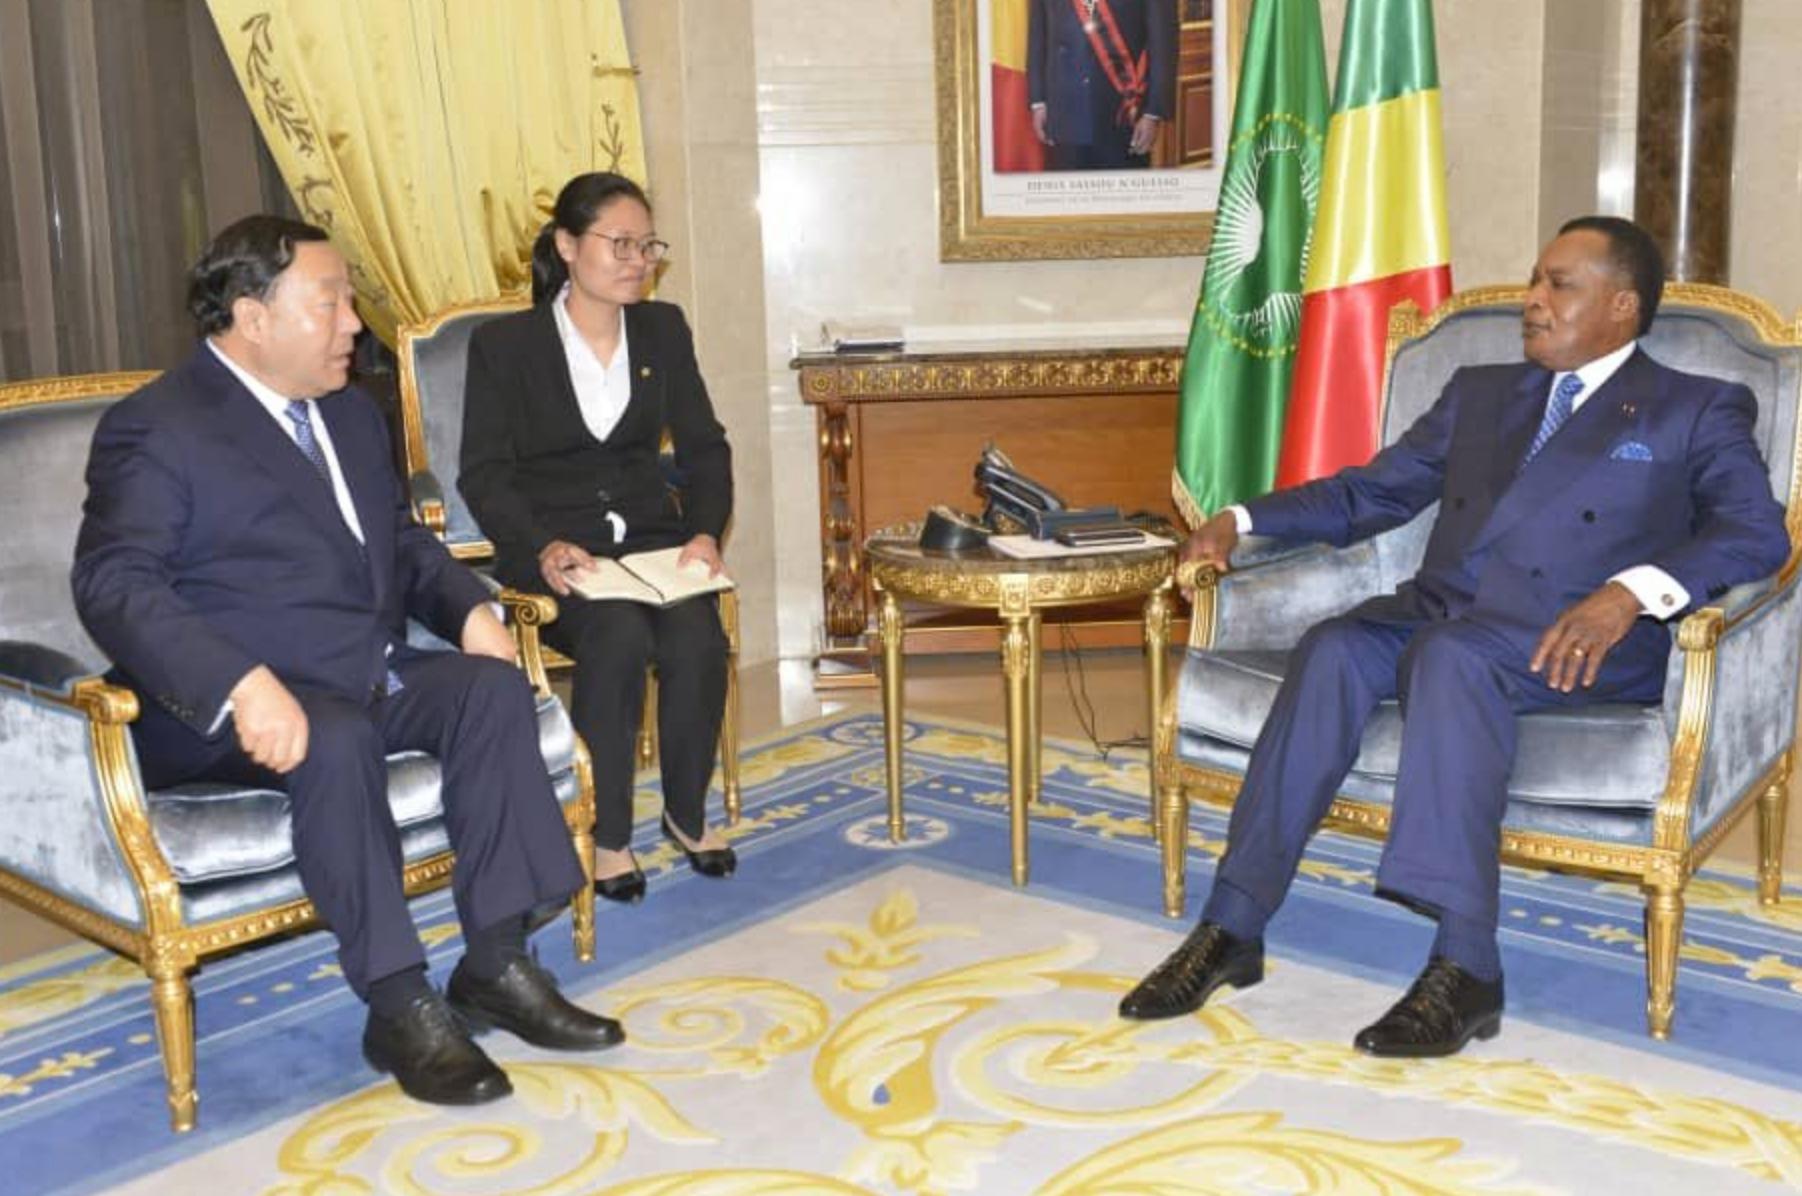 Denis Sassou N'guesso et Lui Zhenya